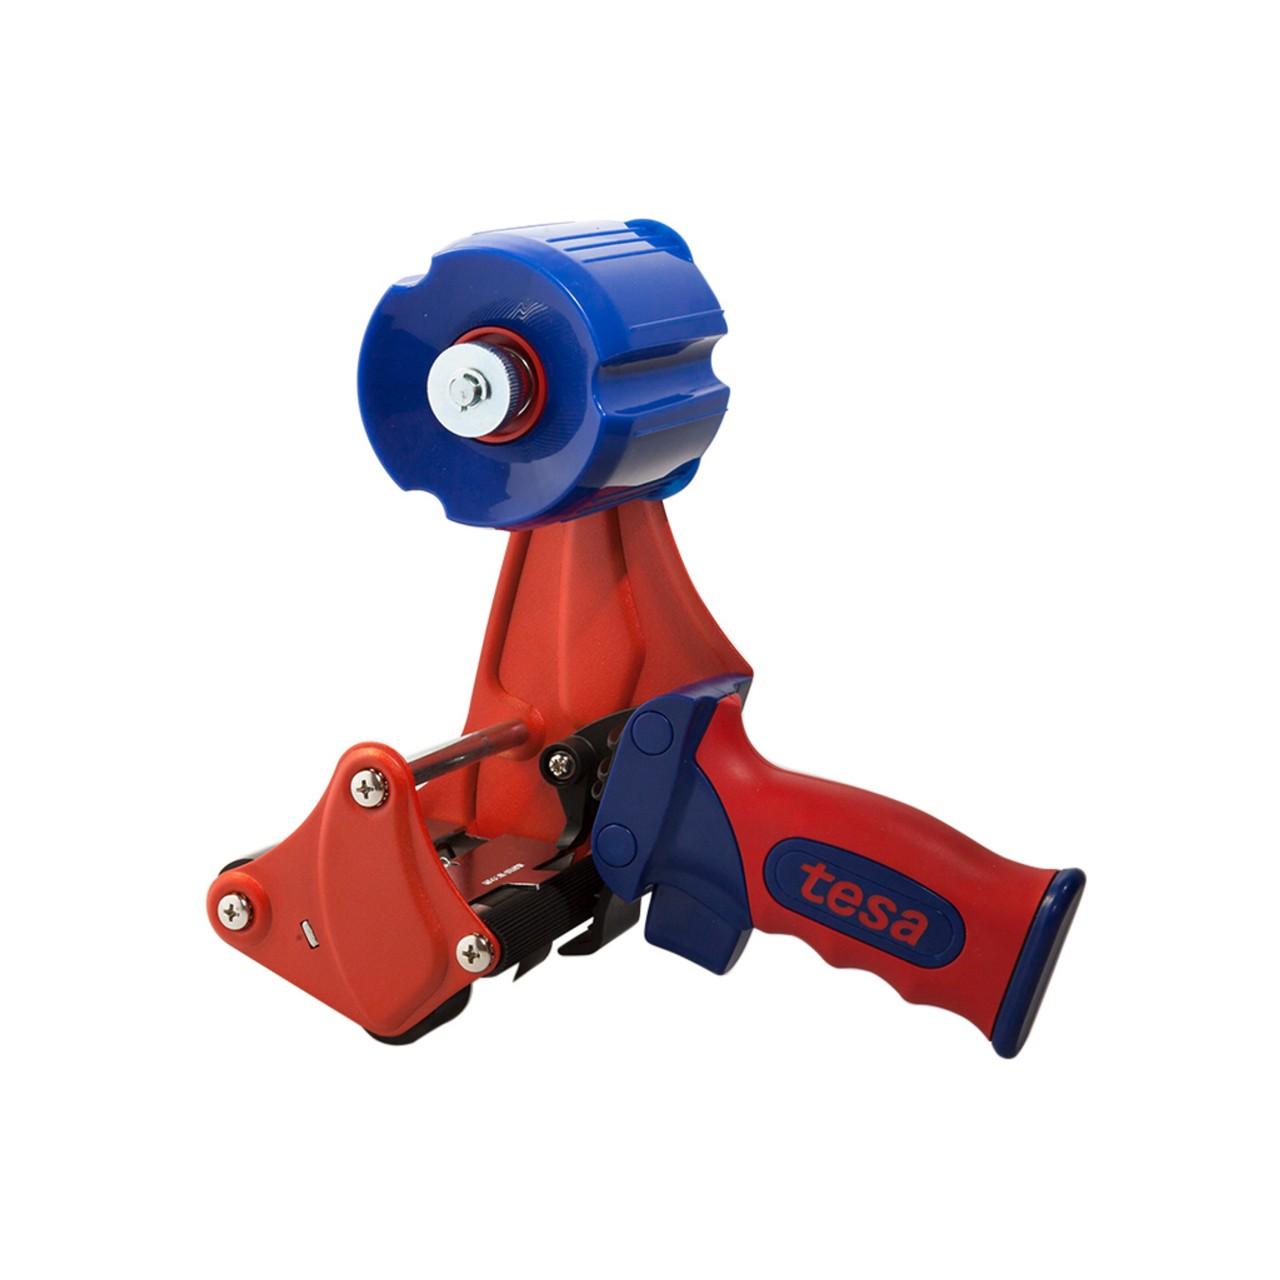 tesa 6075, Handabroller, rot-blau